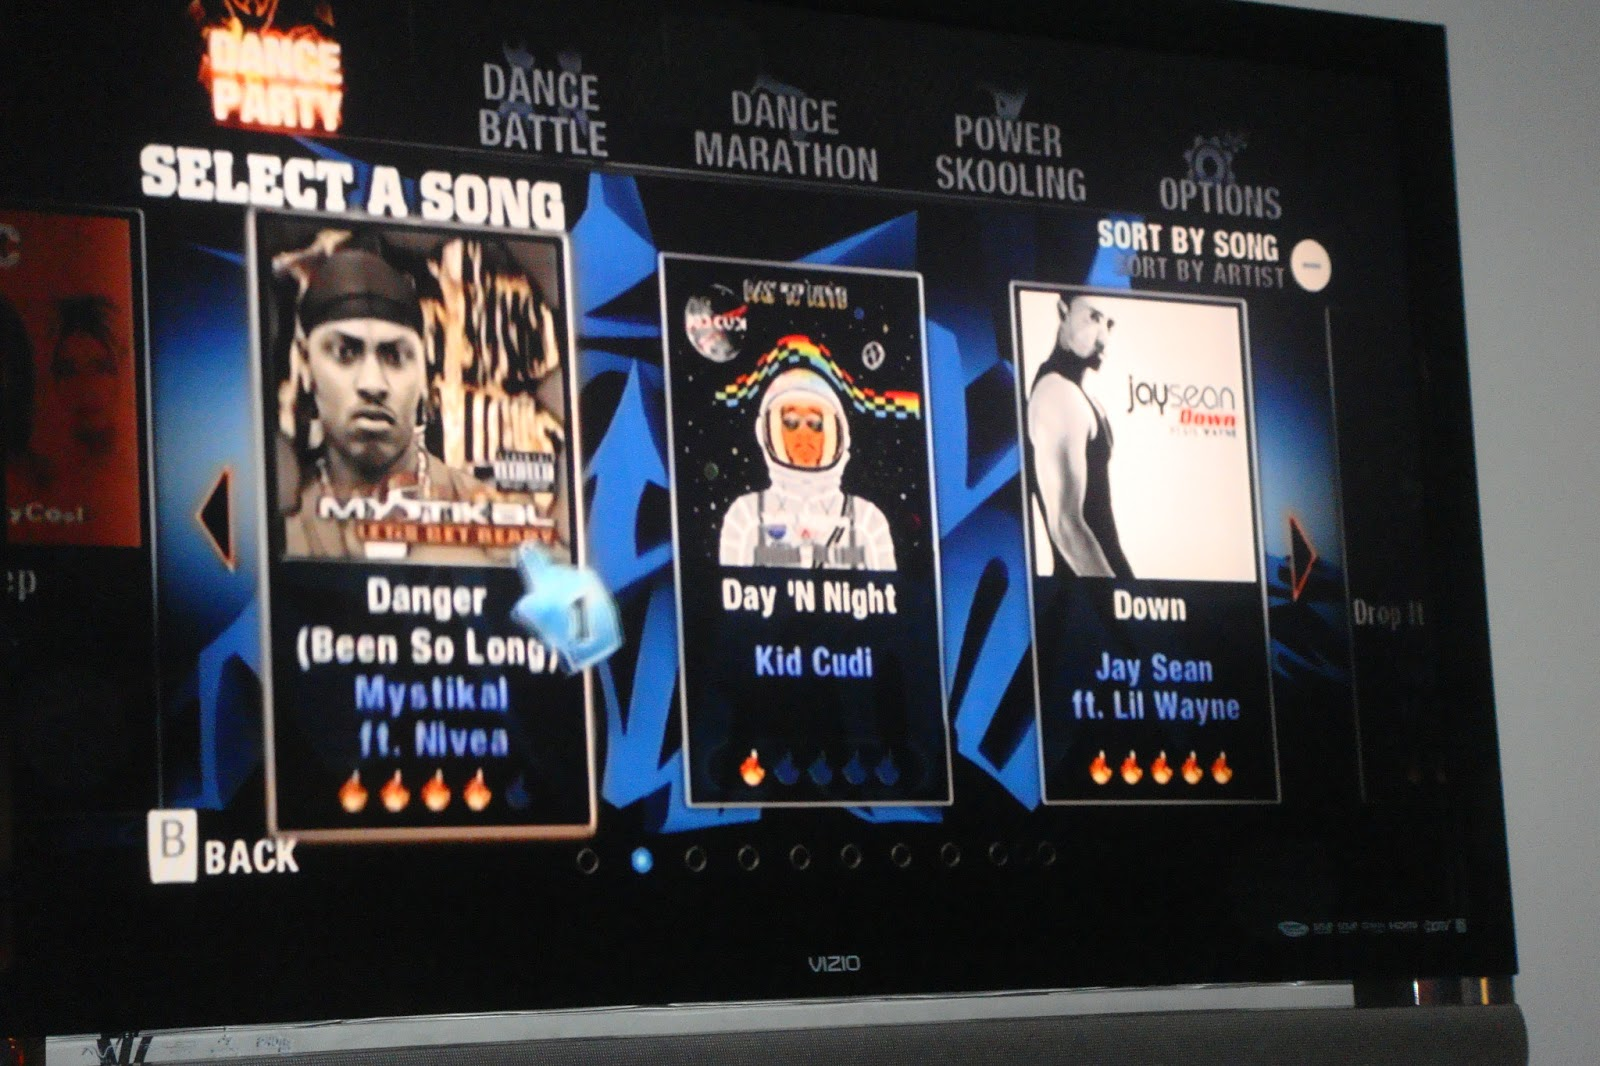 Hip Hop Dance Wii Game Review #UBIChamps - Boyz Rule